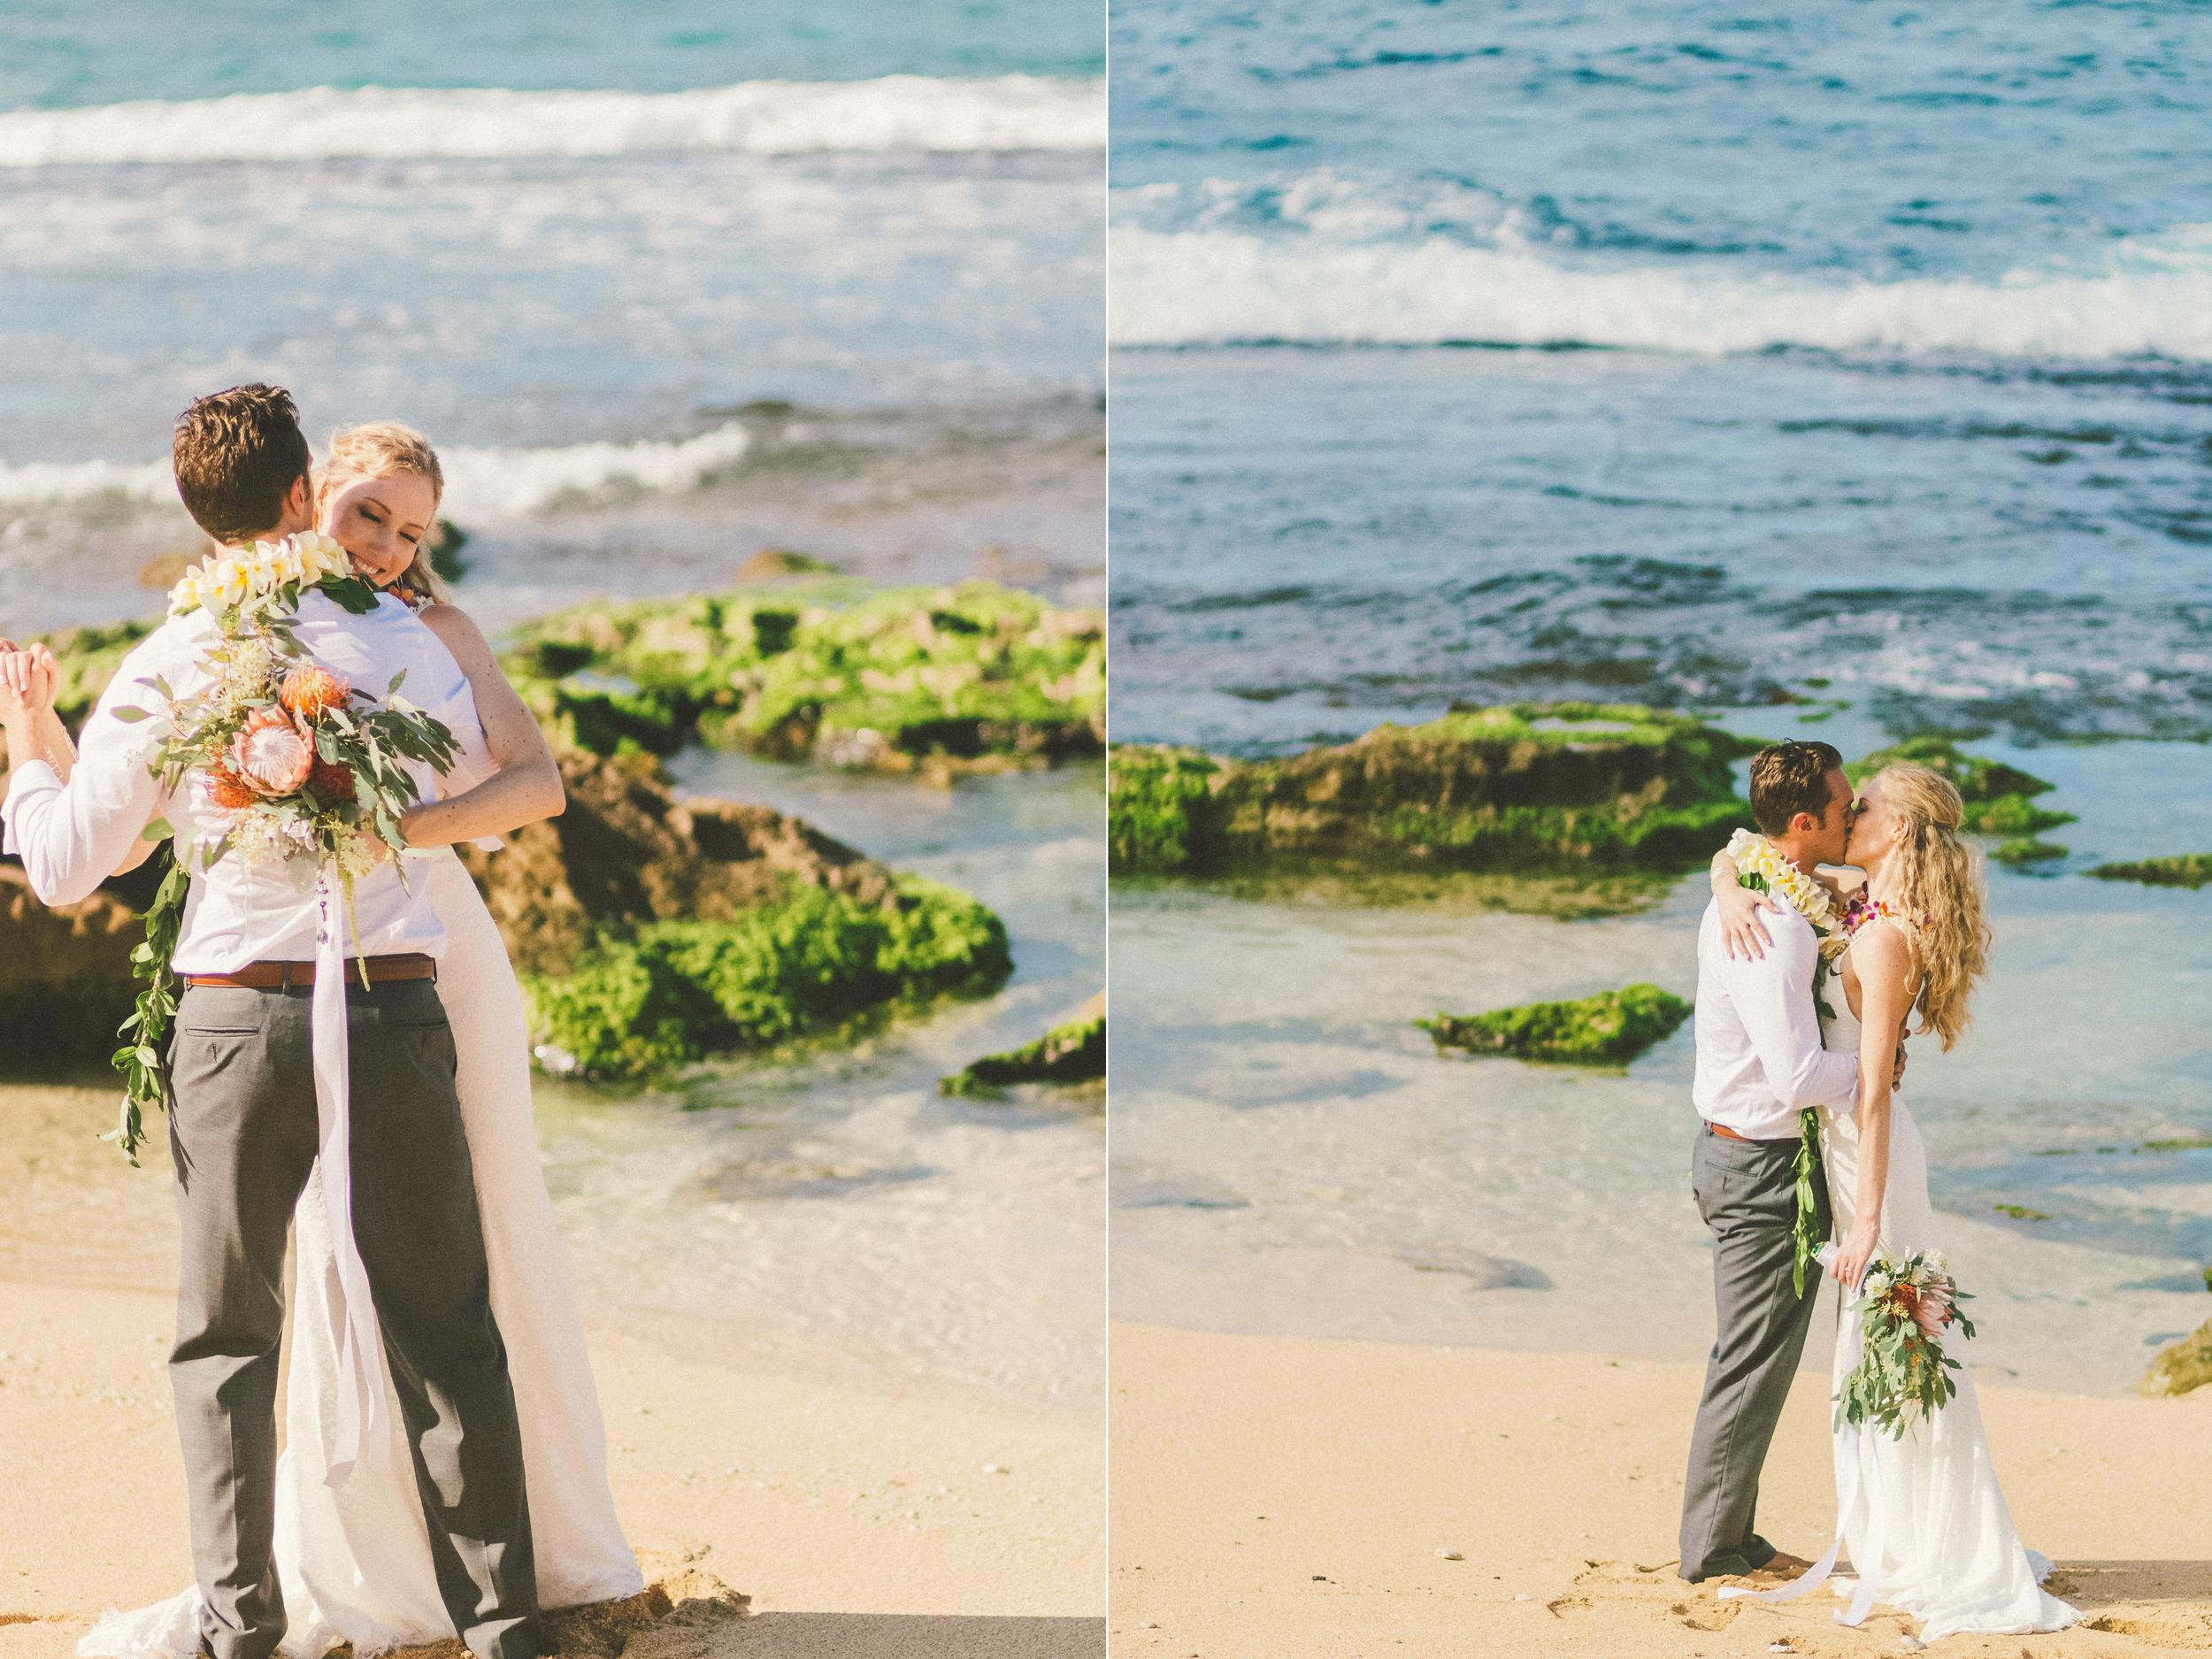 angie-diaz-photography-maui-wedding-70.jpg